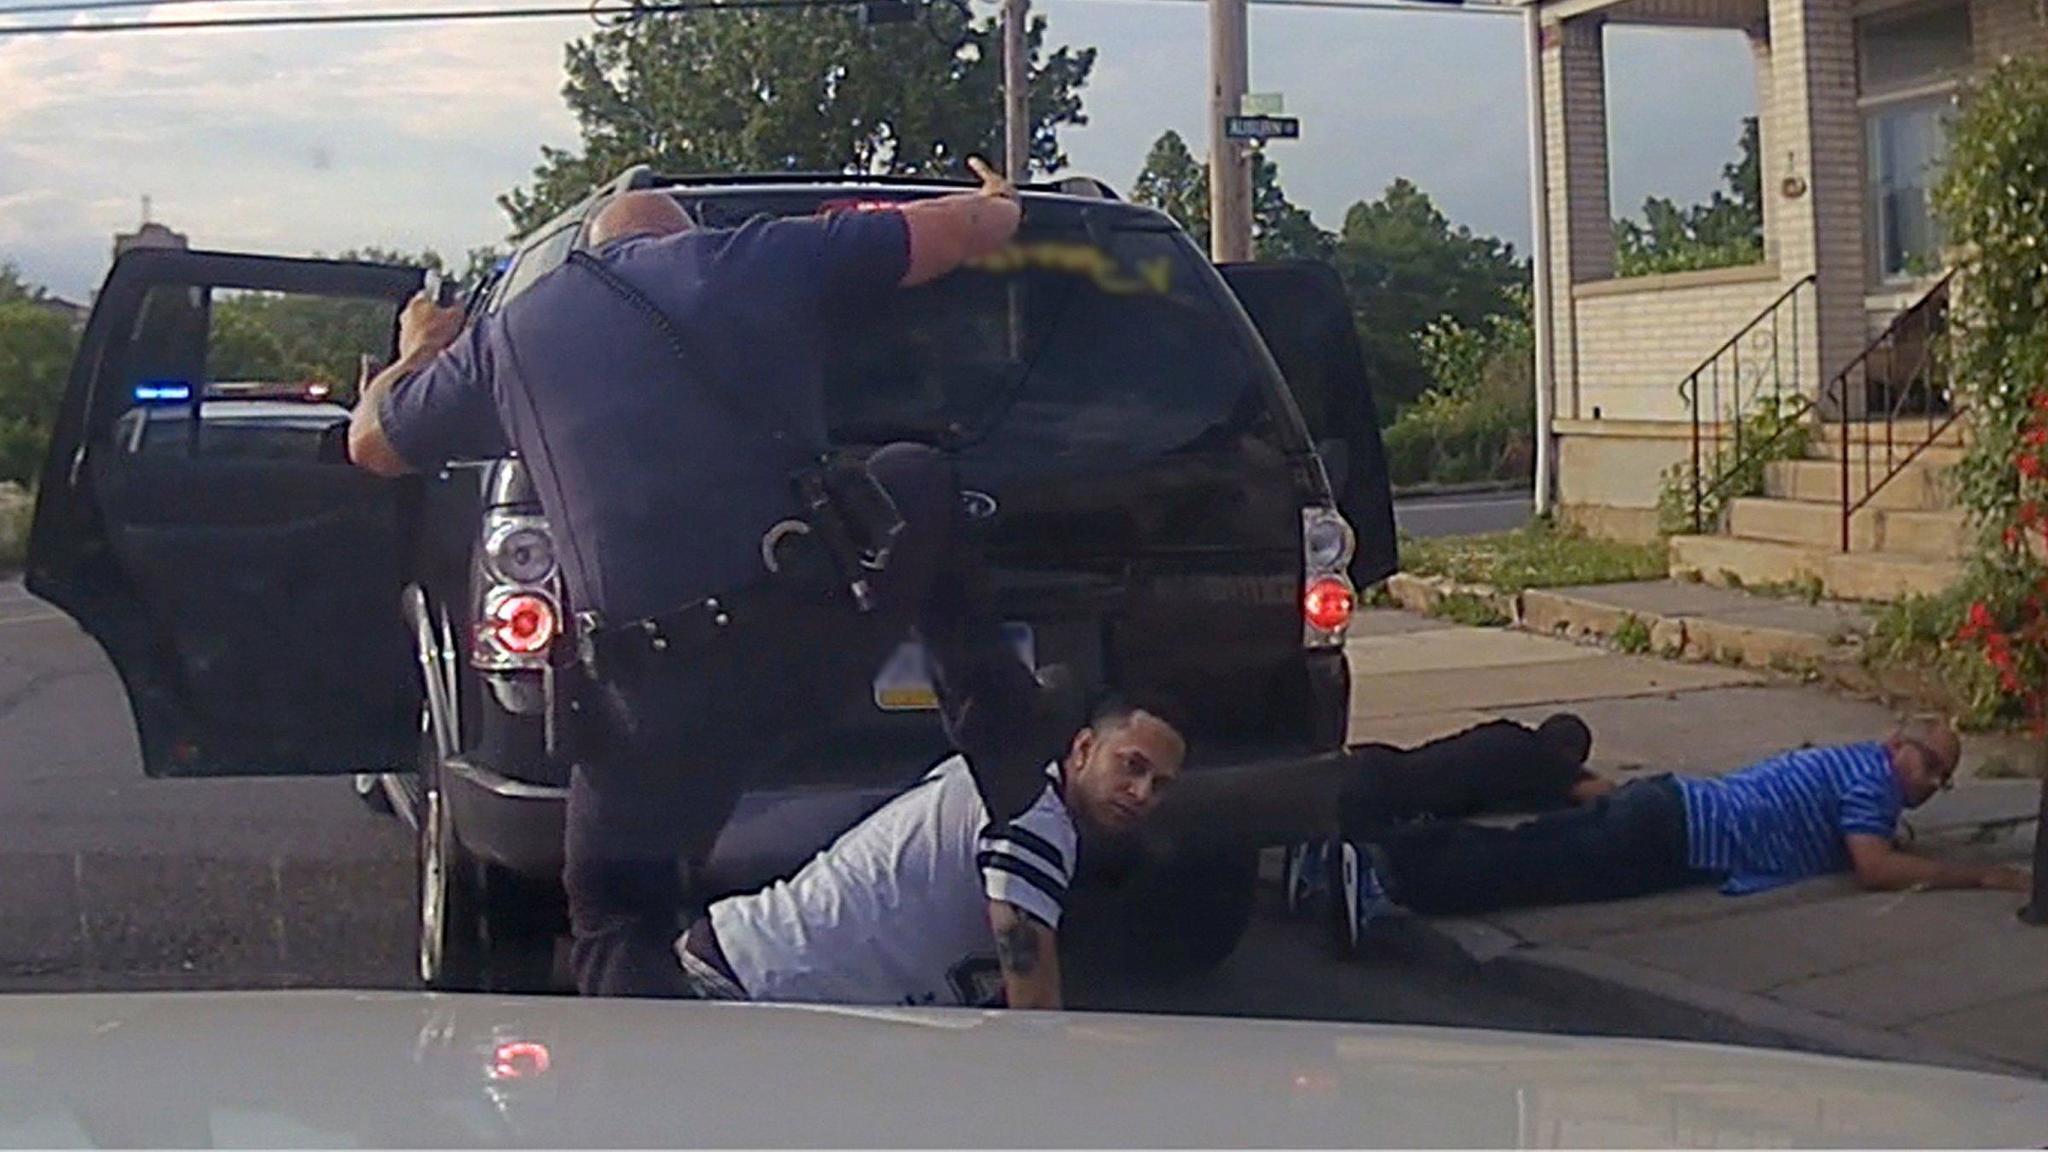 mc-allentown-police-wrestling-kick-excessive-force-lawsuit-20161020